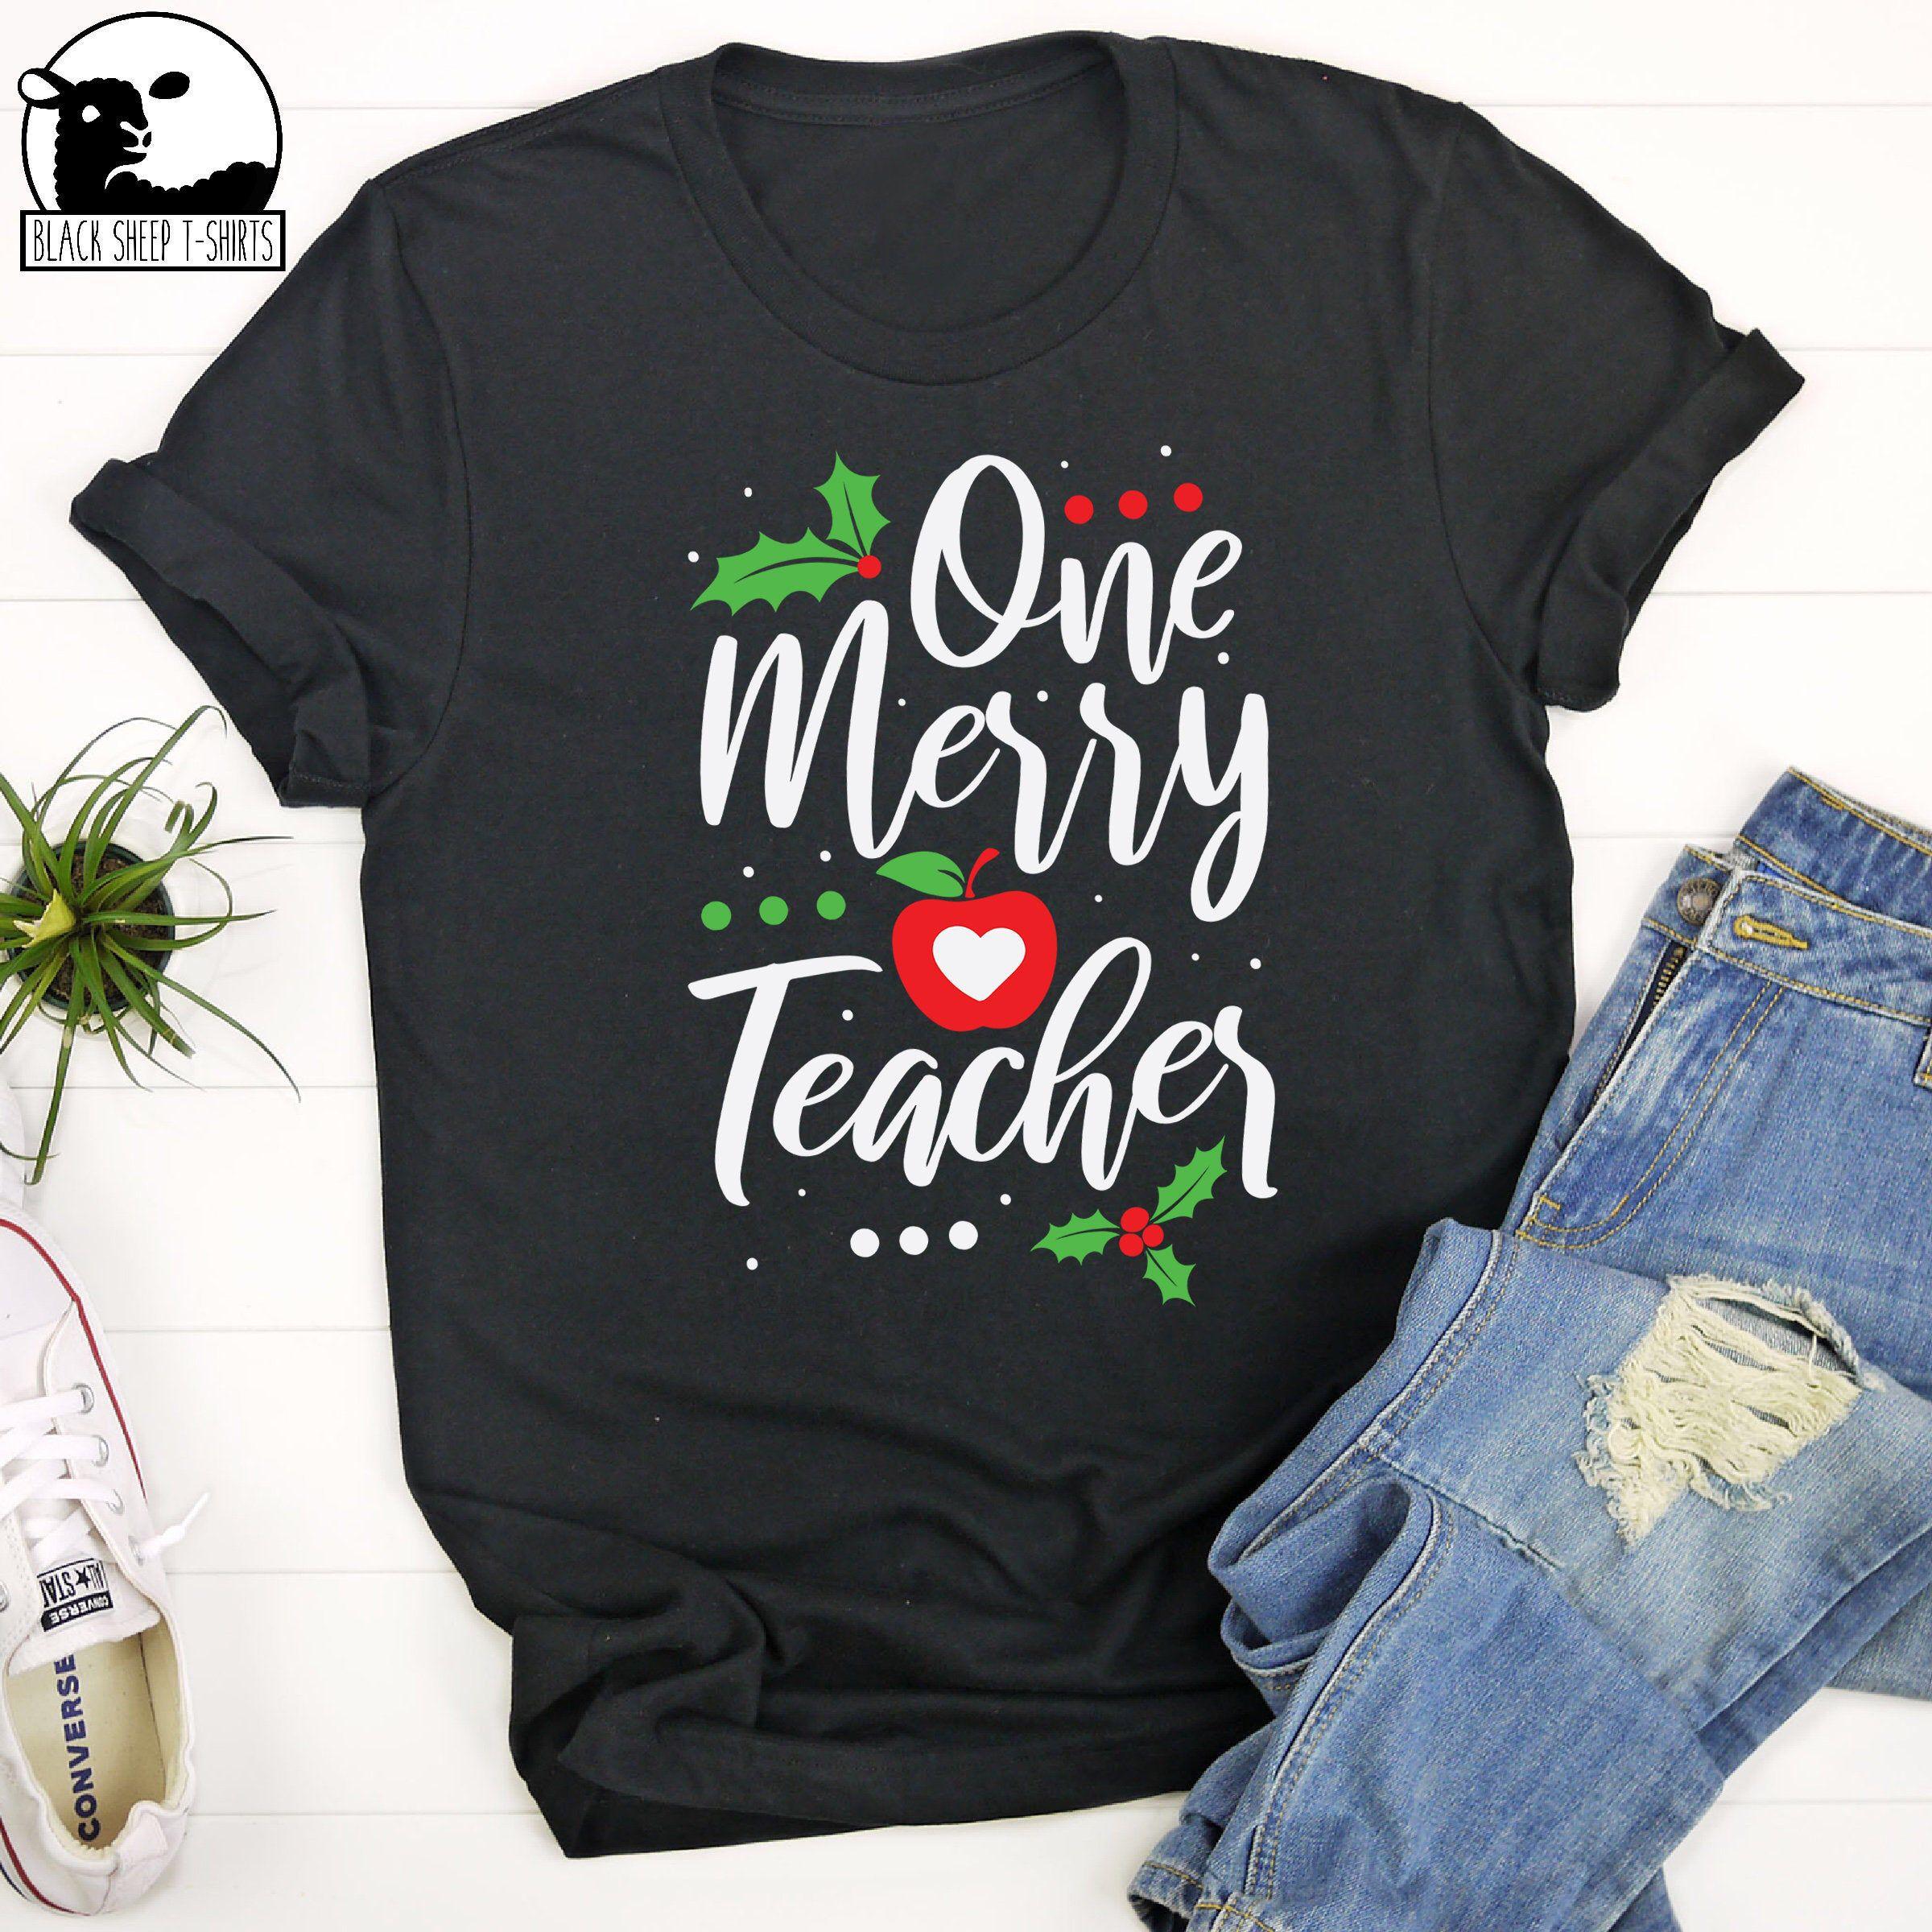 One Merry Teacher TShirt, Merry Teacher, Merry Christmas